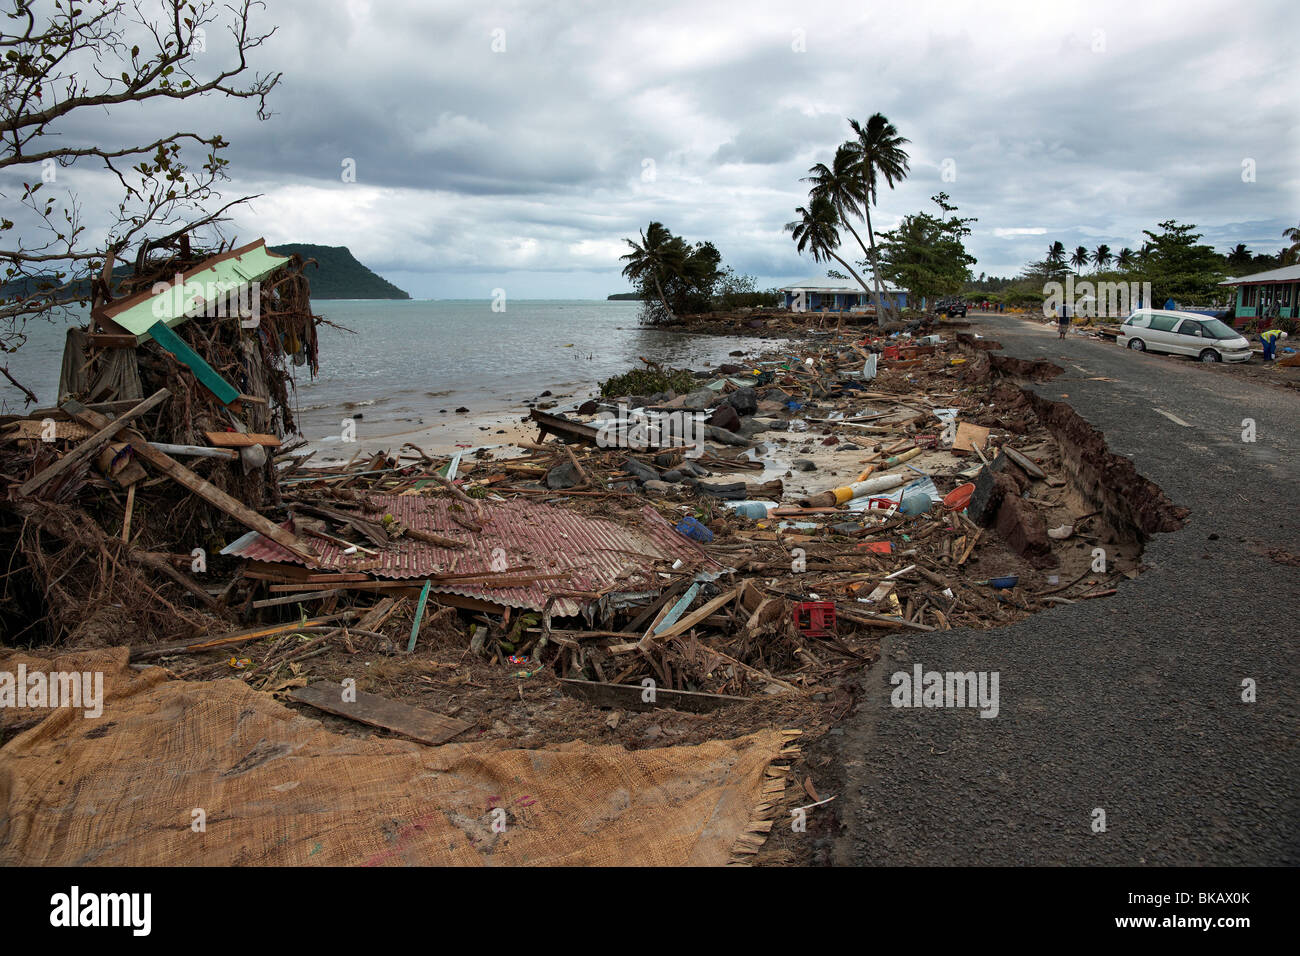 Shoreline and building destruction from 2009 tsunami, Aleipata, Upolu island, Samoa - Stock Image